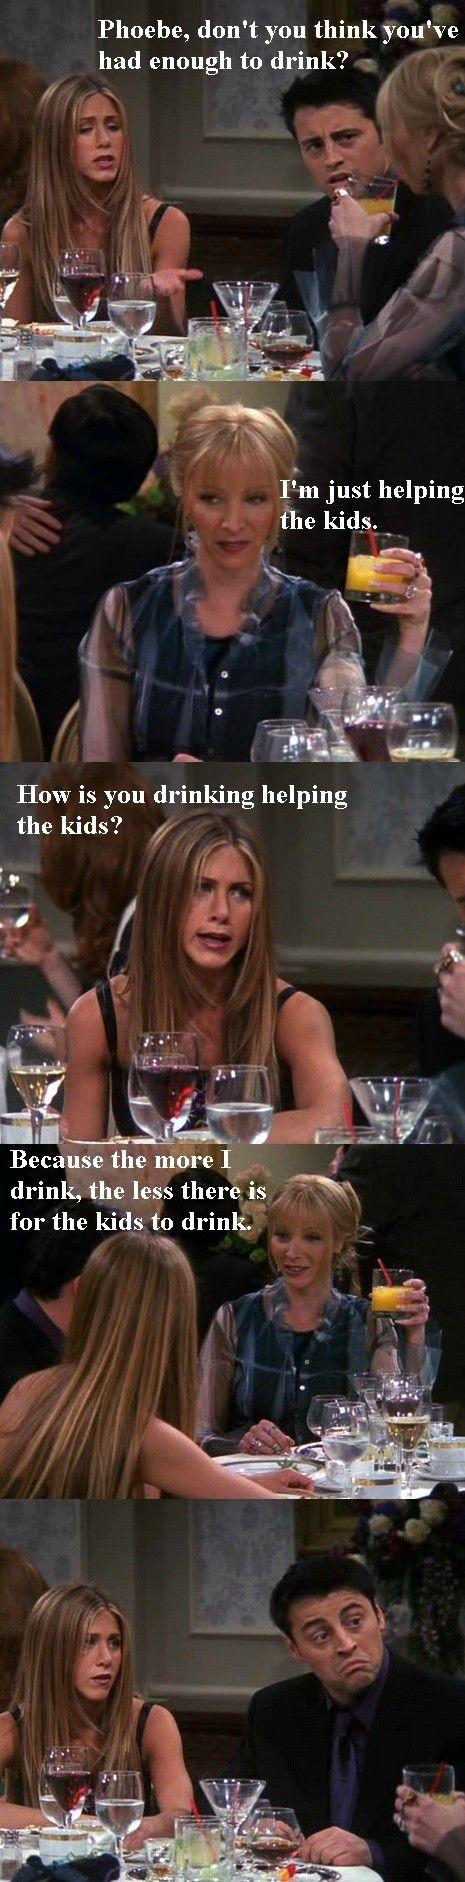 Hahahaha love Phoebe